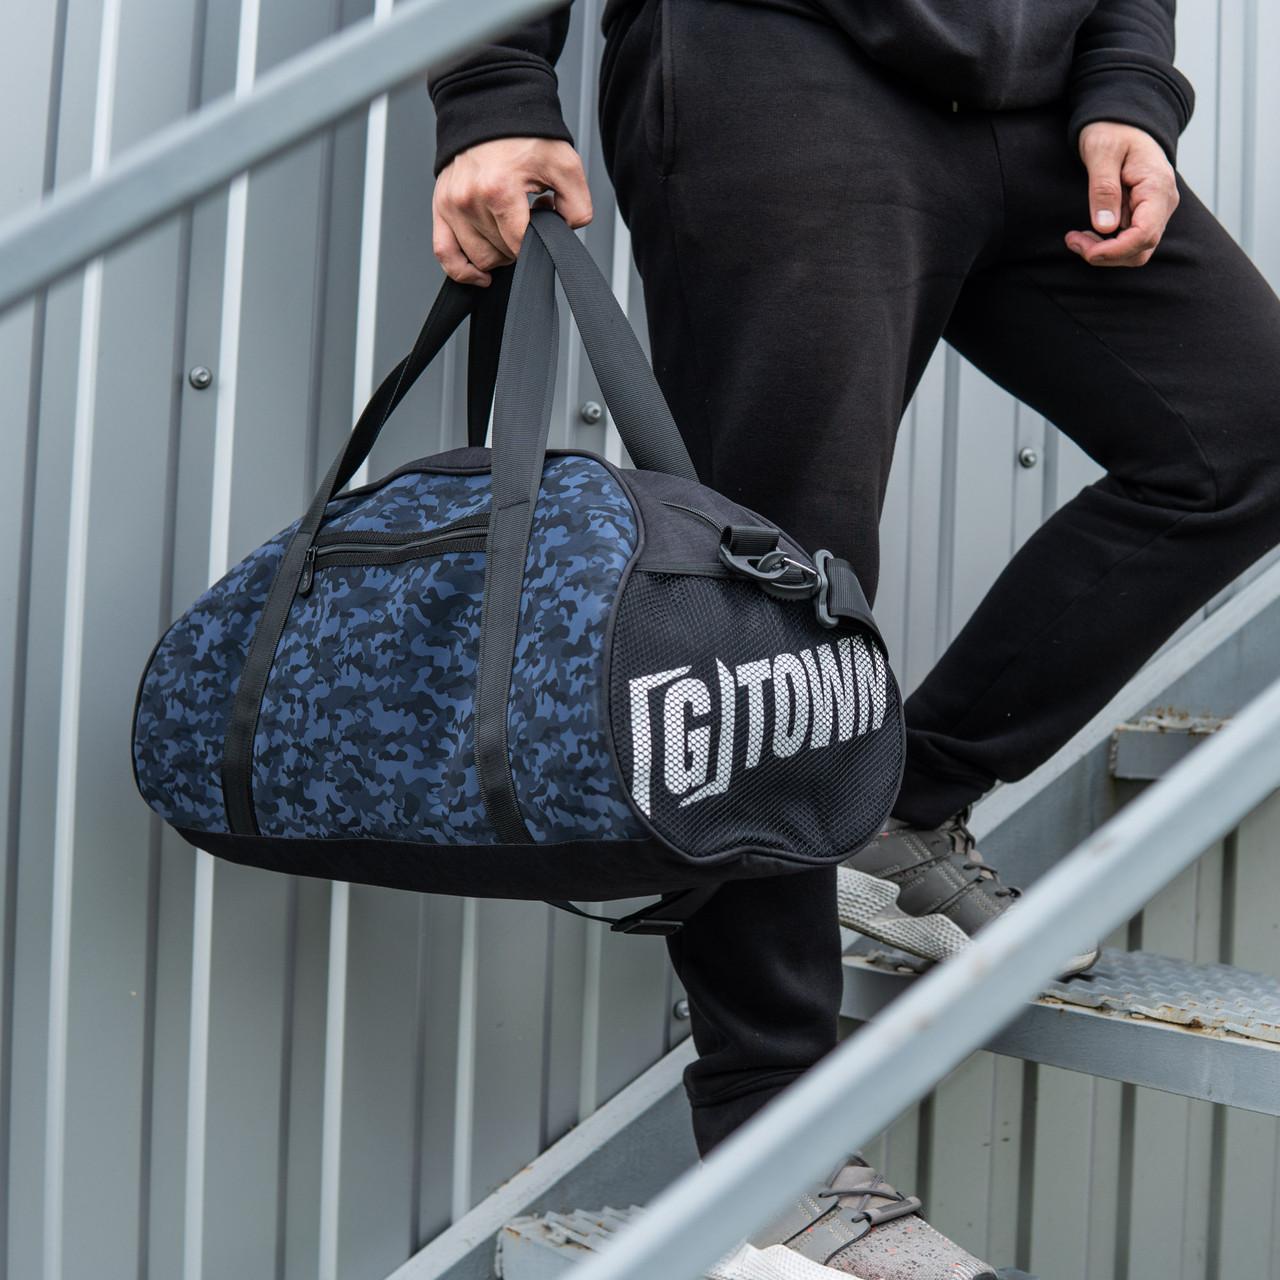 Мужская спортивная сумка G-TOWN синяя